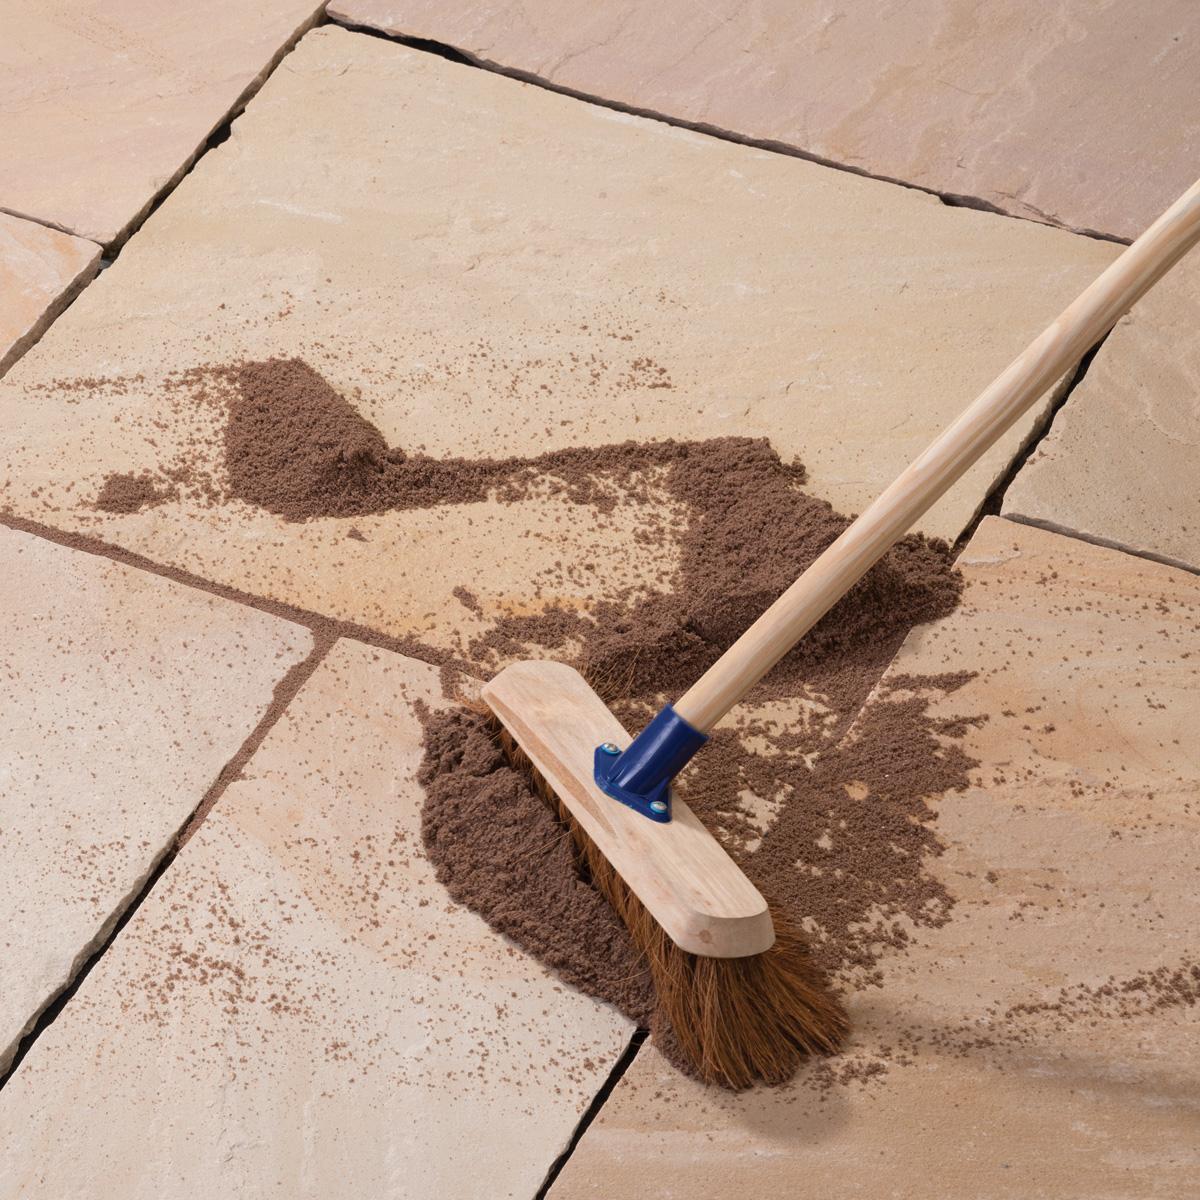 Brush into gaps between paving